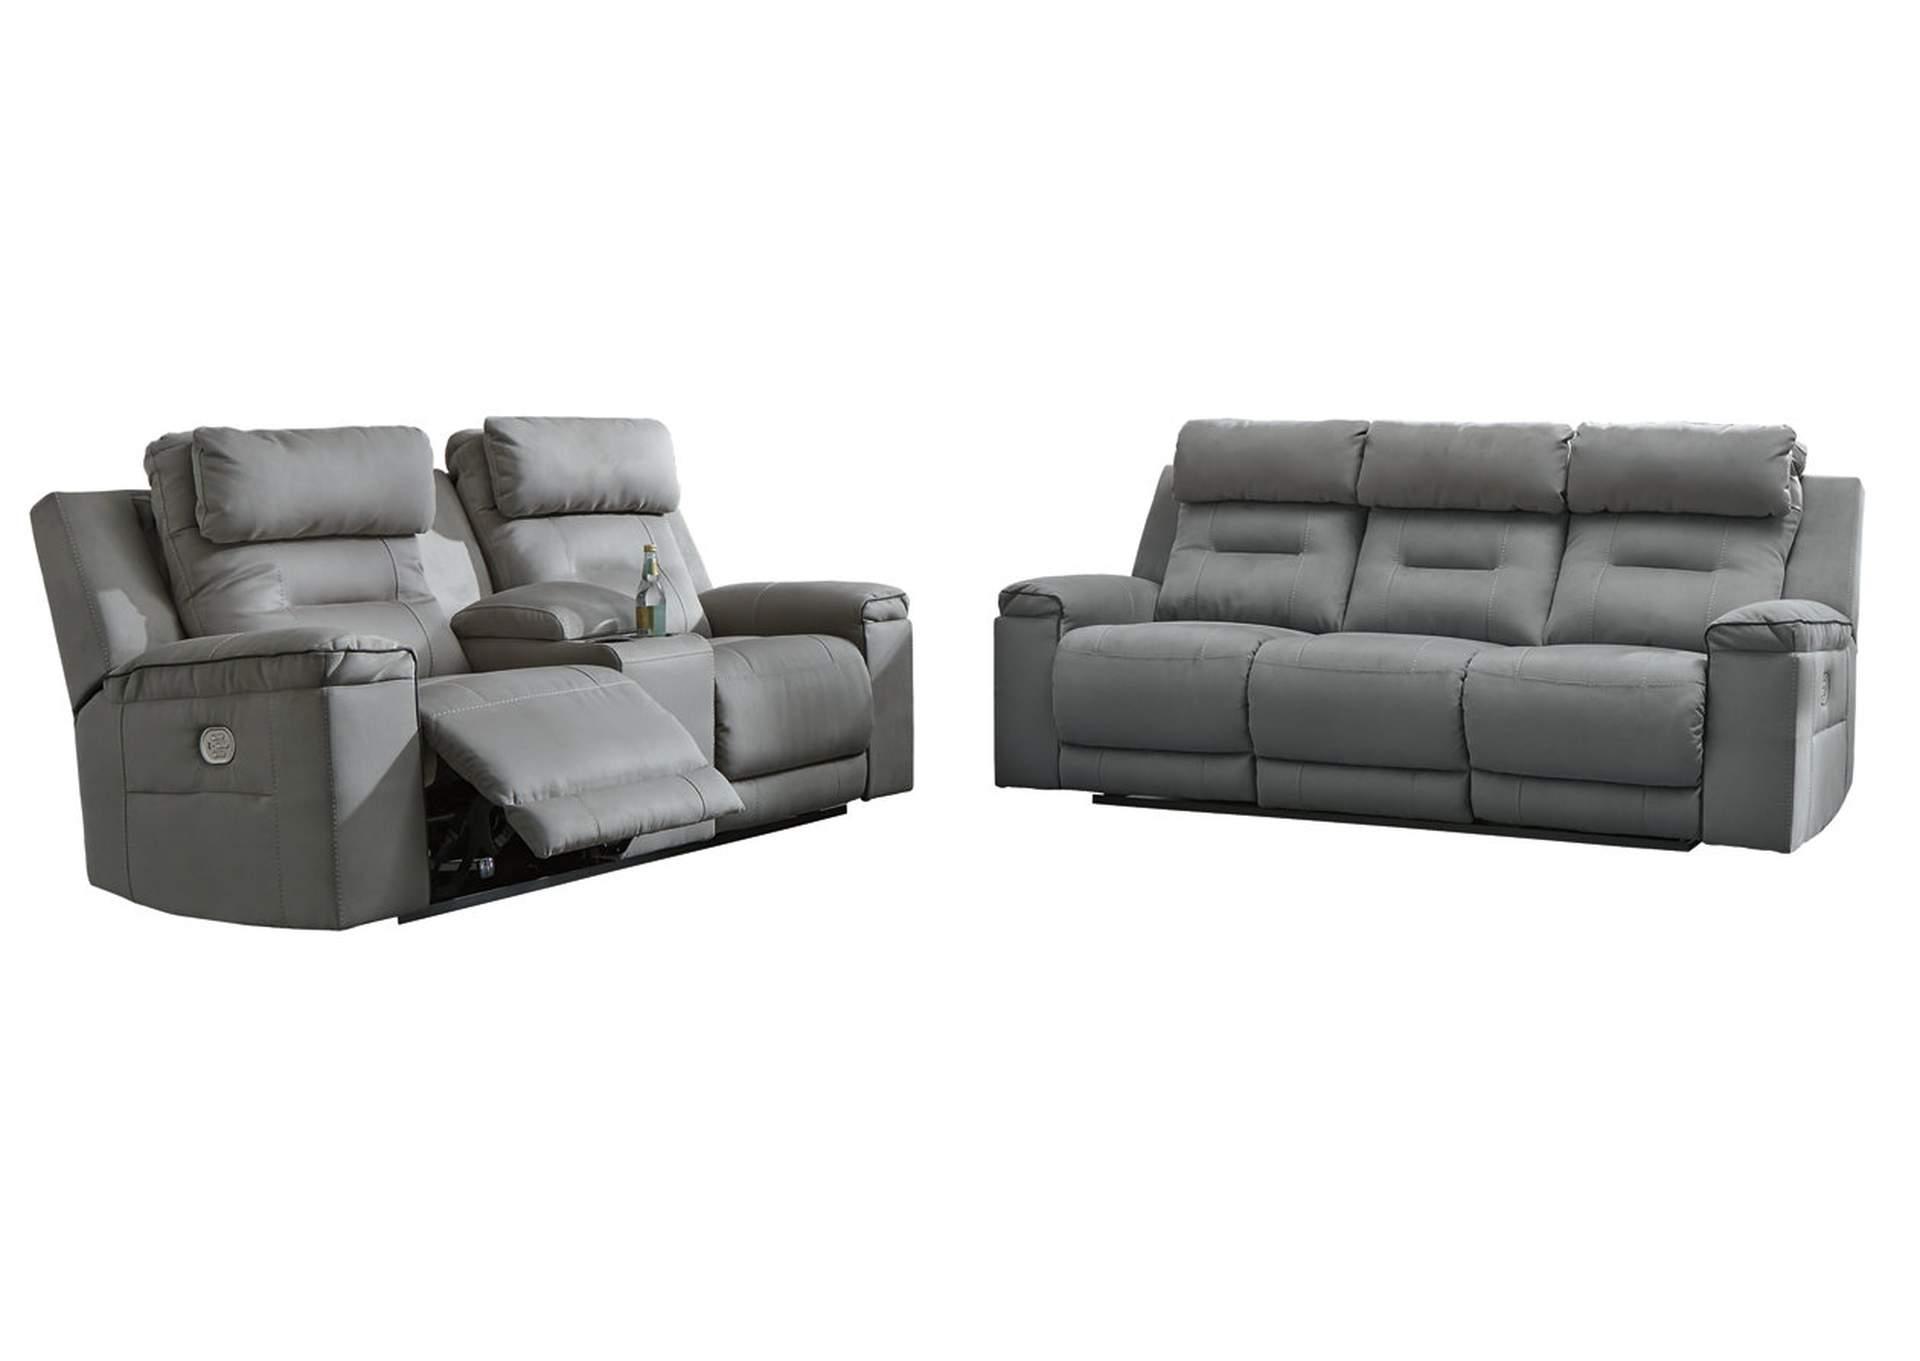 Stupendous Austins Couch Potatoes Furniture Stores Austin Texas Frankydiablos Diy Chair Ideas Frankydiabloscom